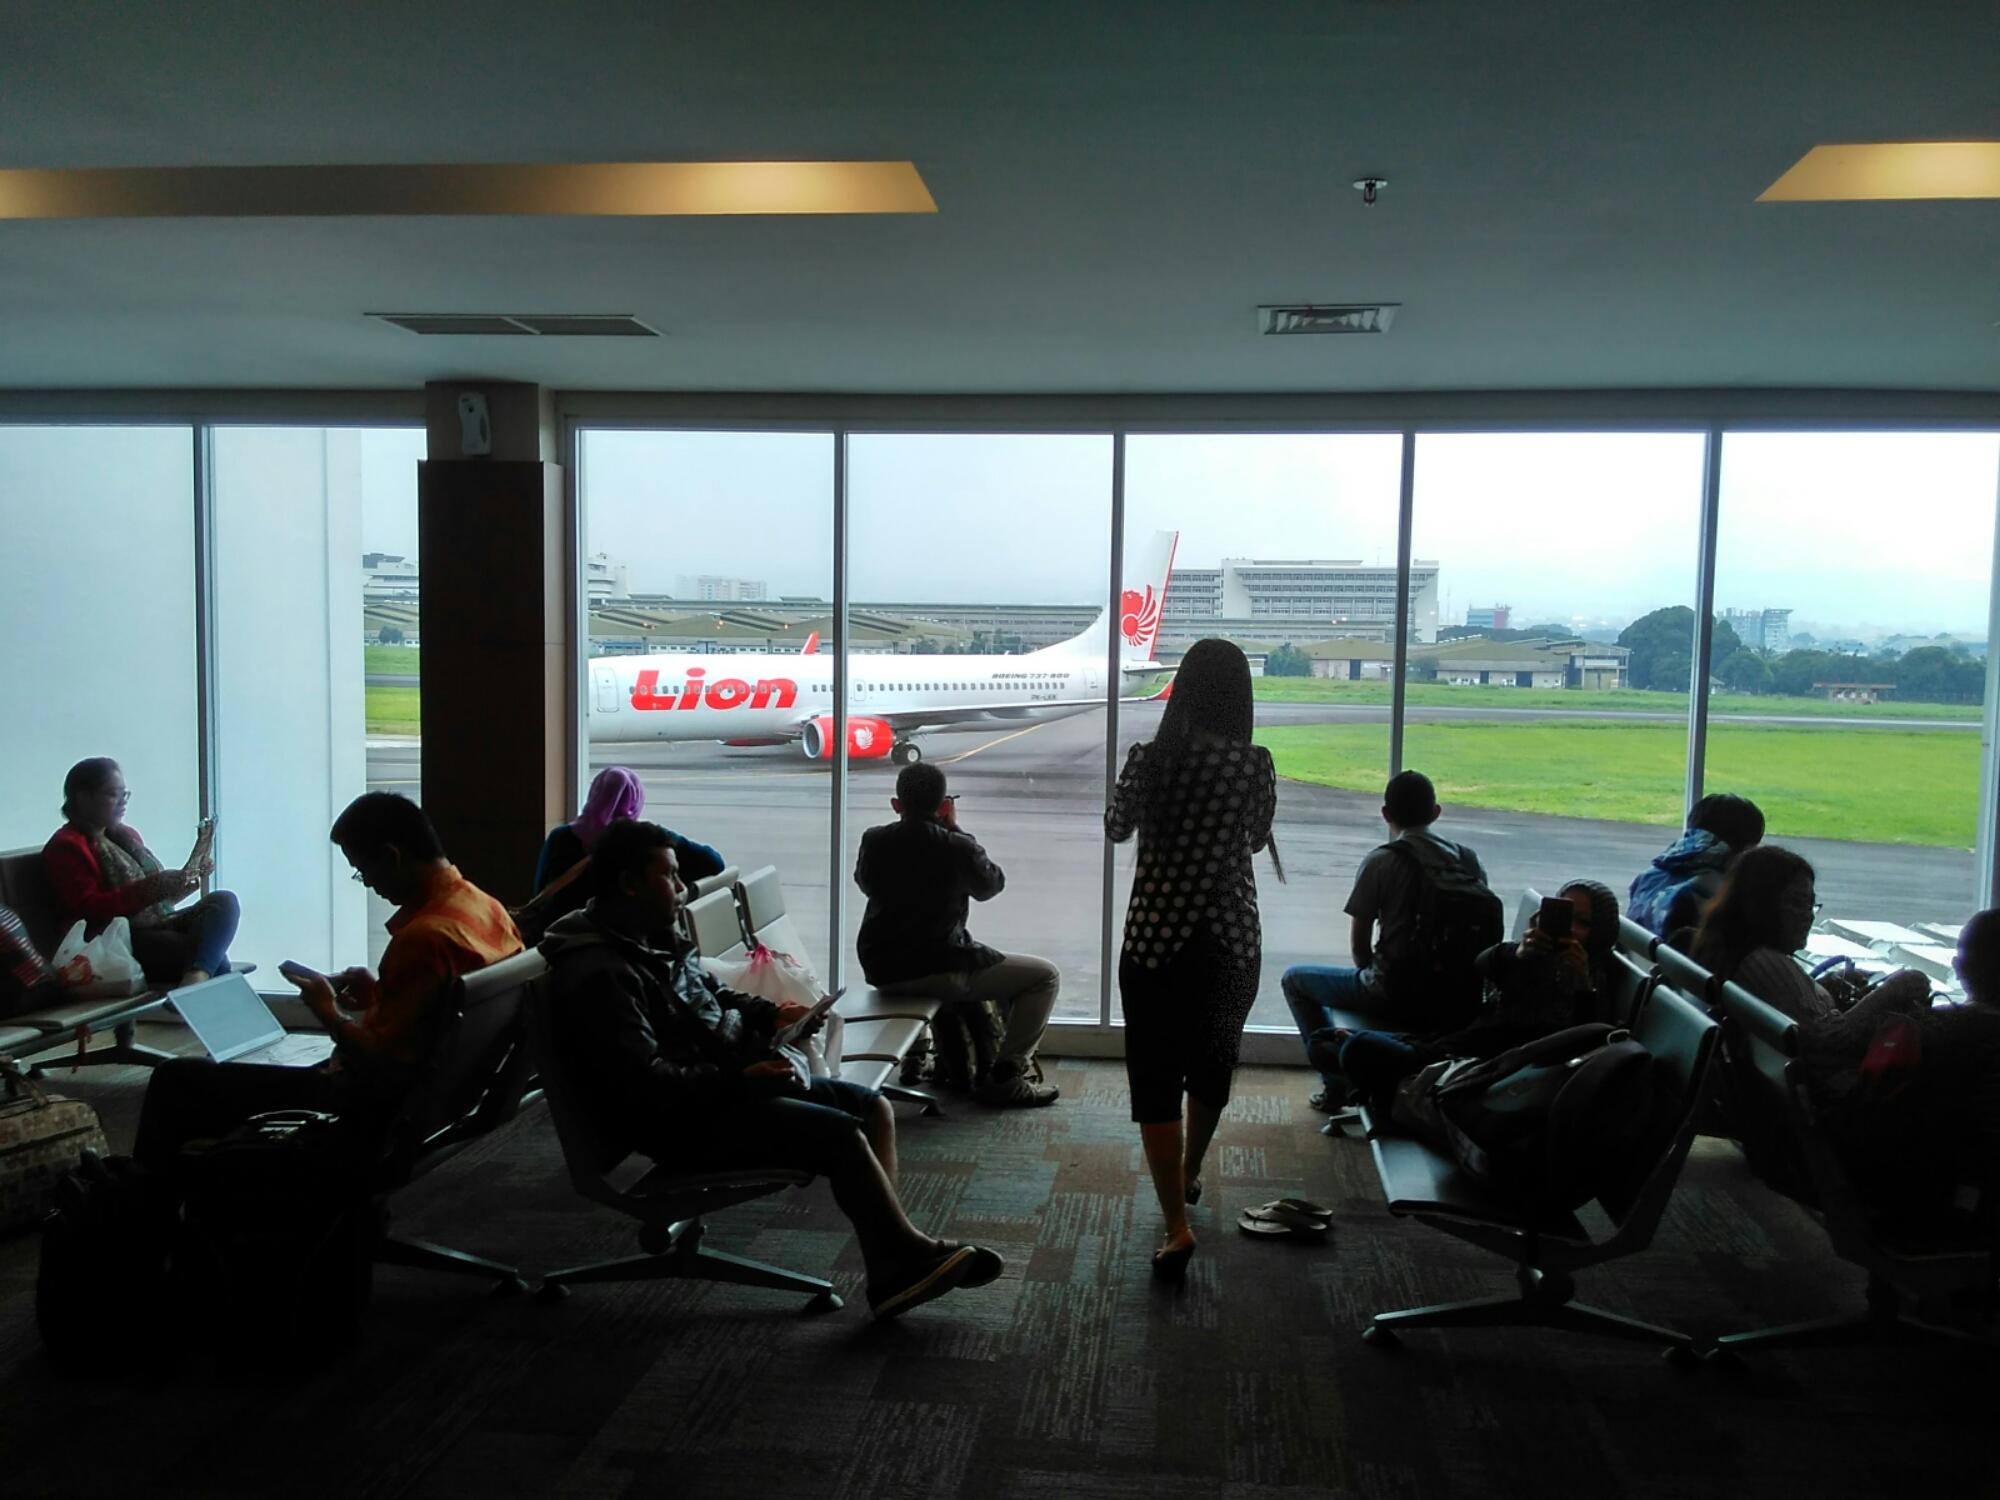 terminal bandara husein sastranegara | Asambackpacker01's Blog